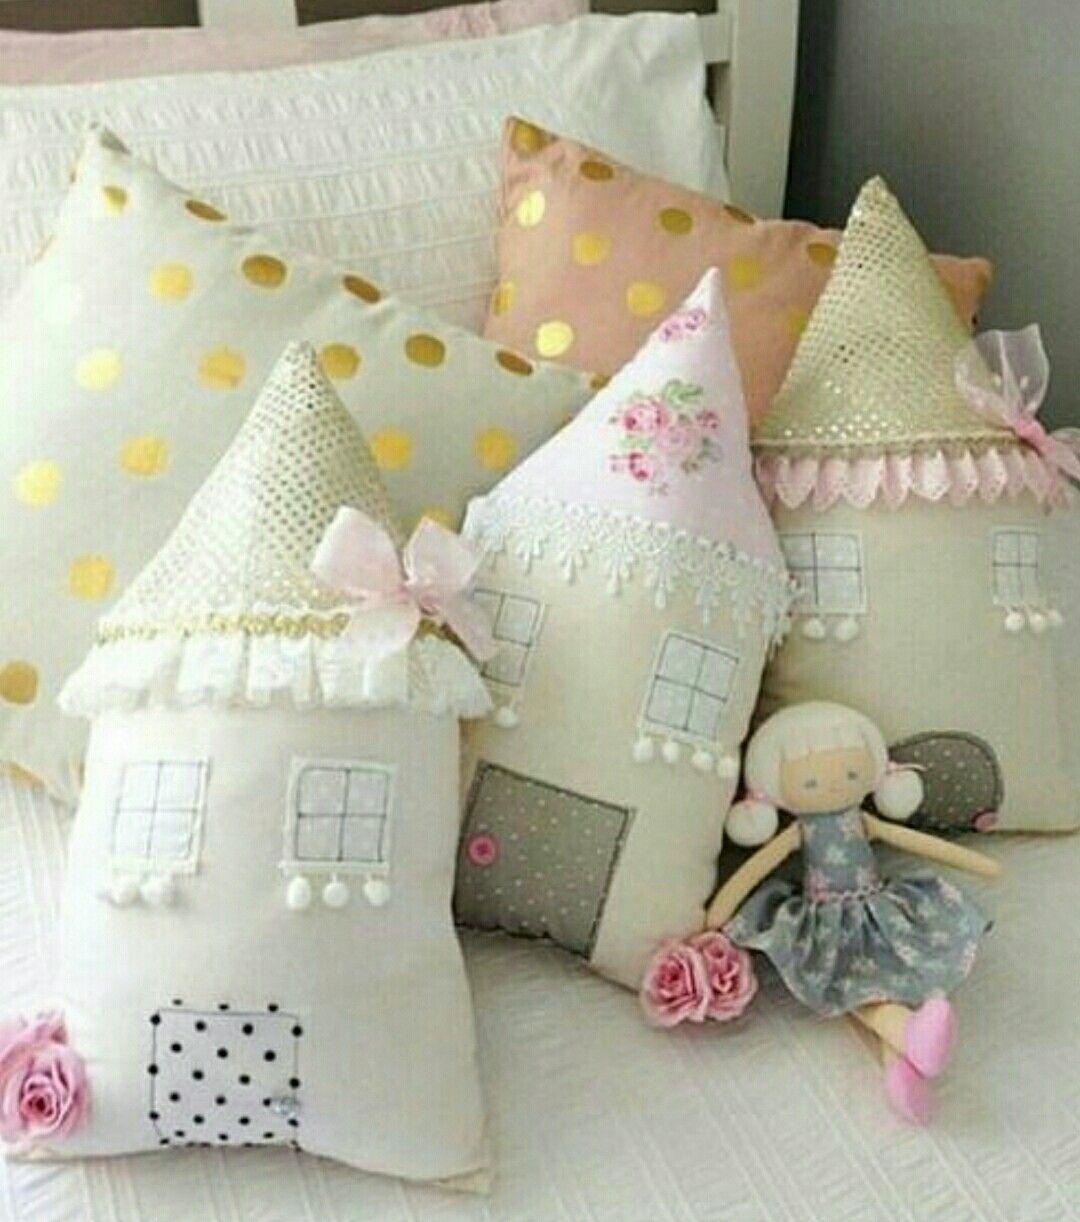 Pin von Cilem Kayaaslan auf pillow | Pinterest | Esel, Nähe und Nähen